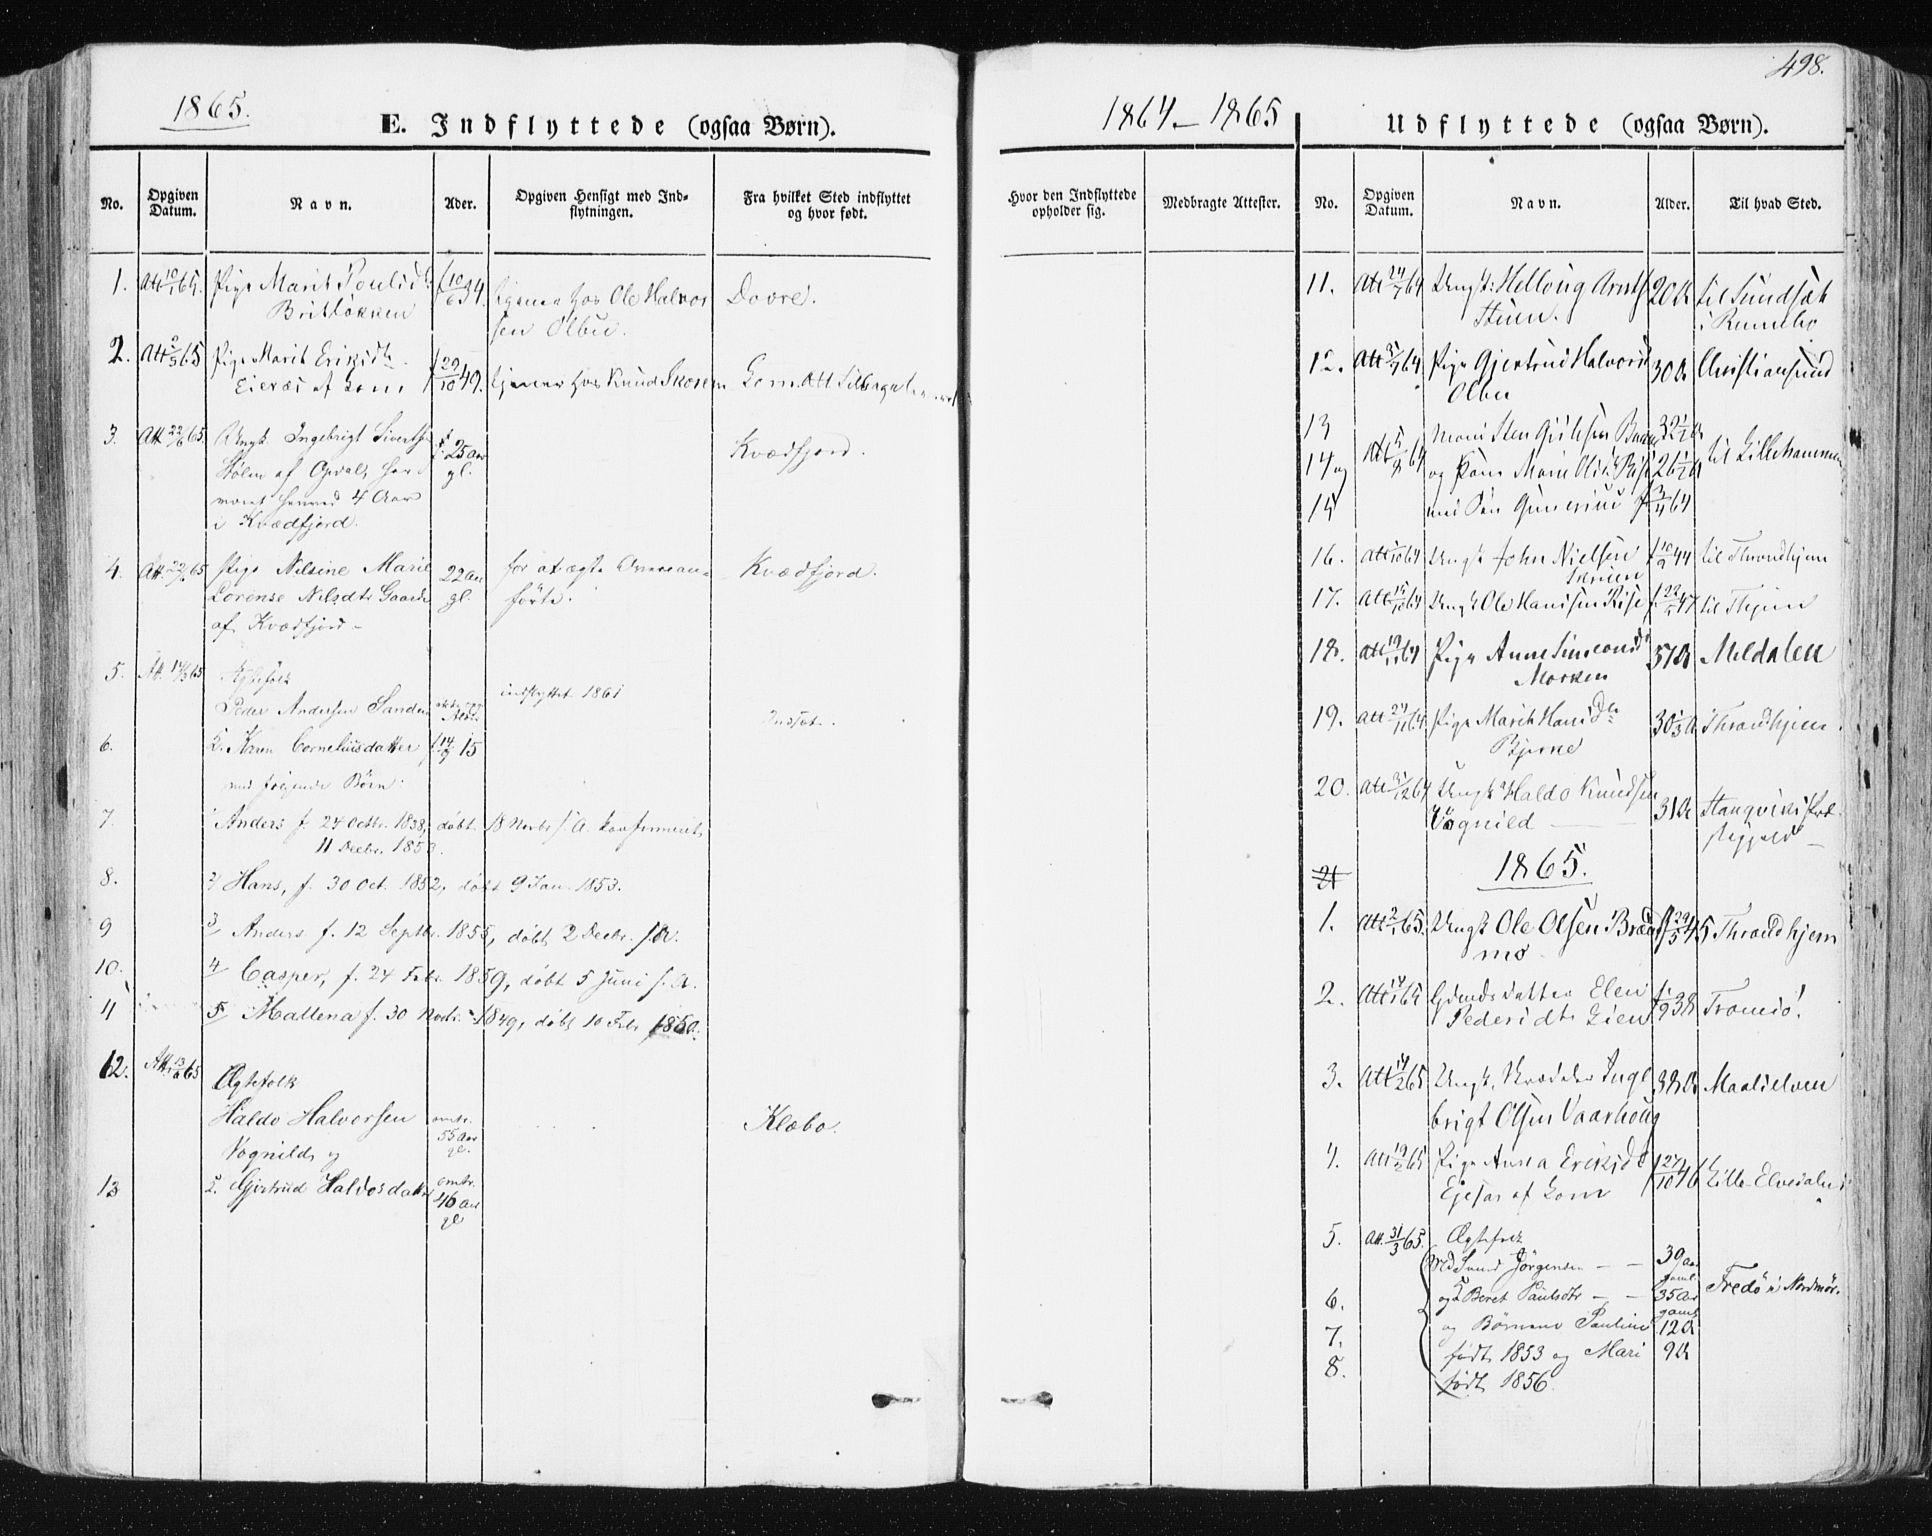 SAT, Ministerialprotokoller, klokkerbøker og fødselsregistre - Sør-Trøndelag, 678/L0899: Parish register (official) no. 678A08, 1848-1872, p. 498